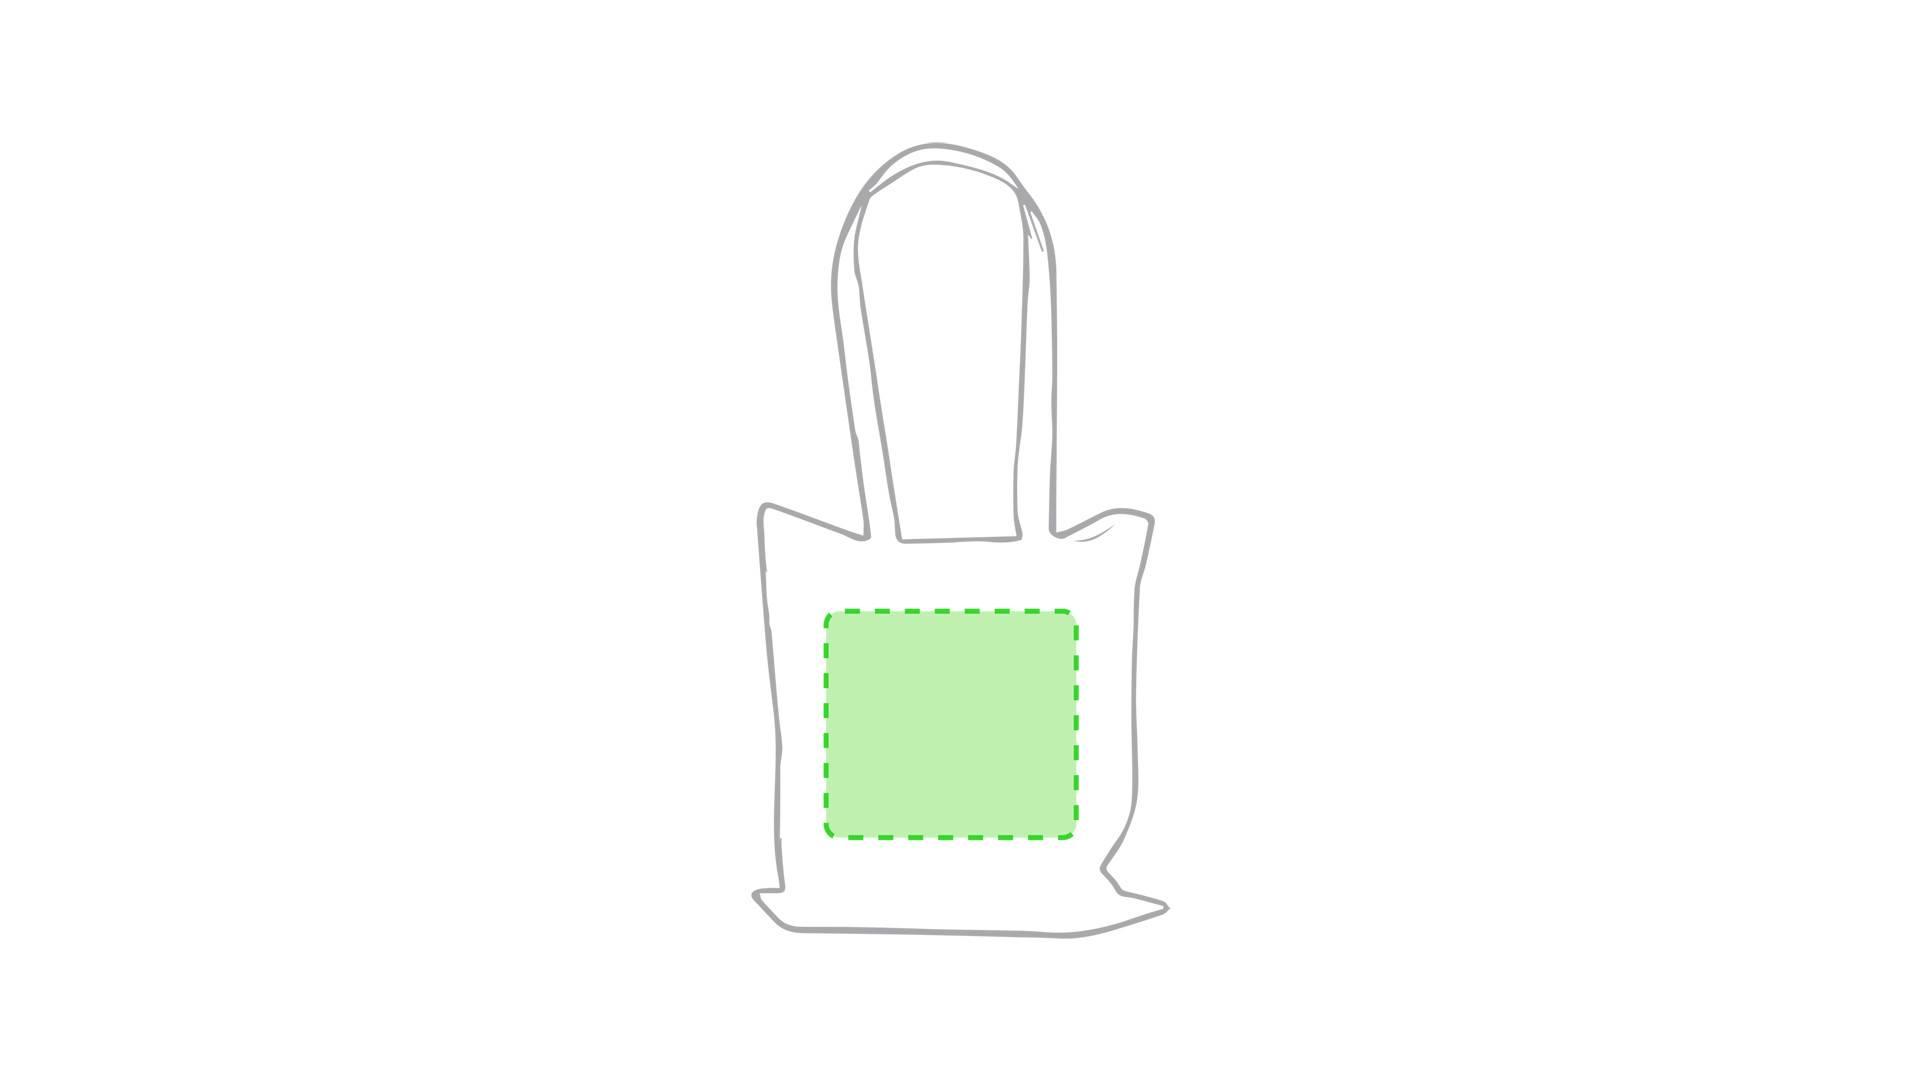 Bolsa de algodón 105 gr/m2 1